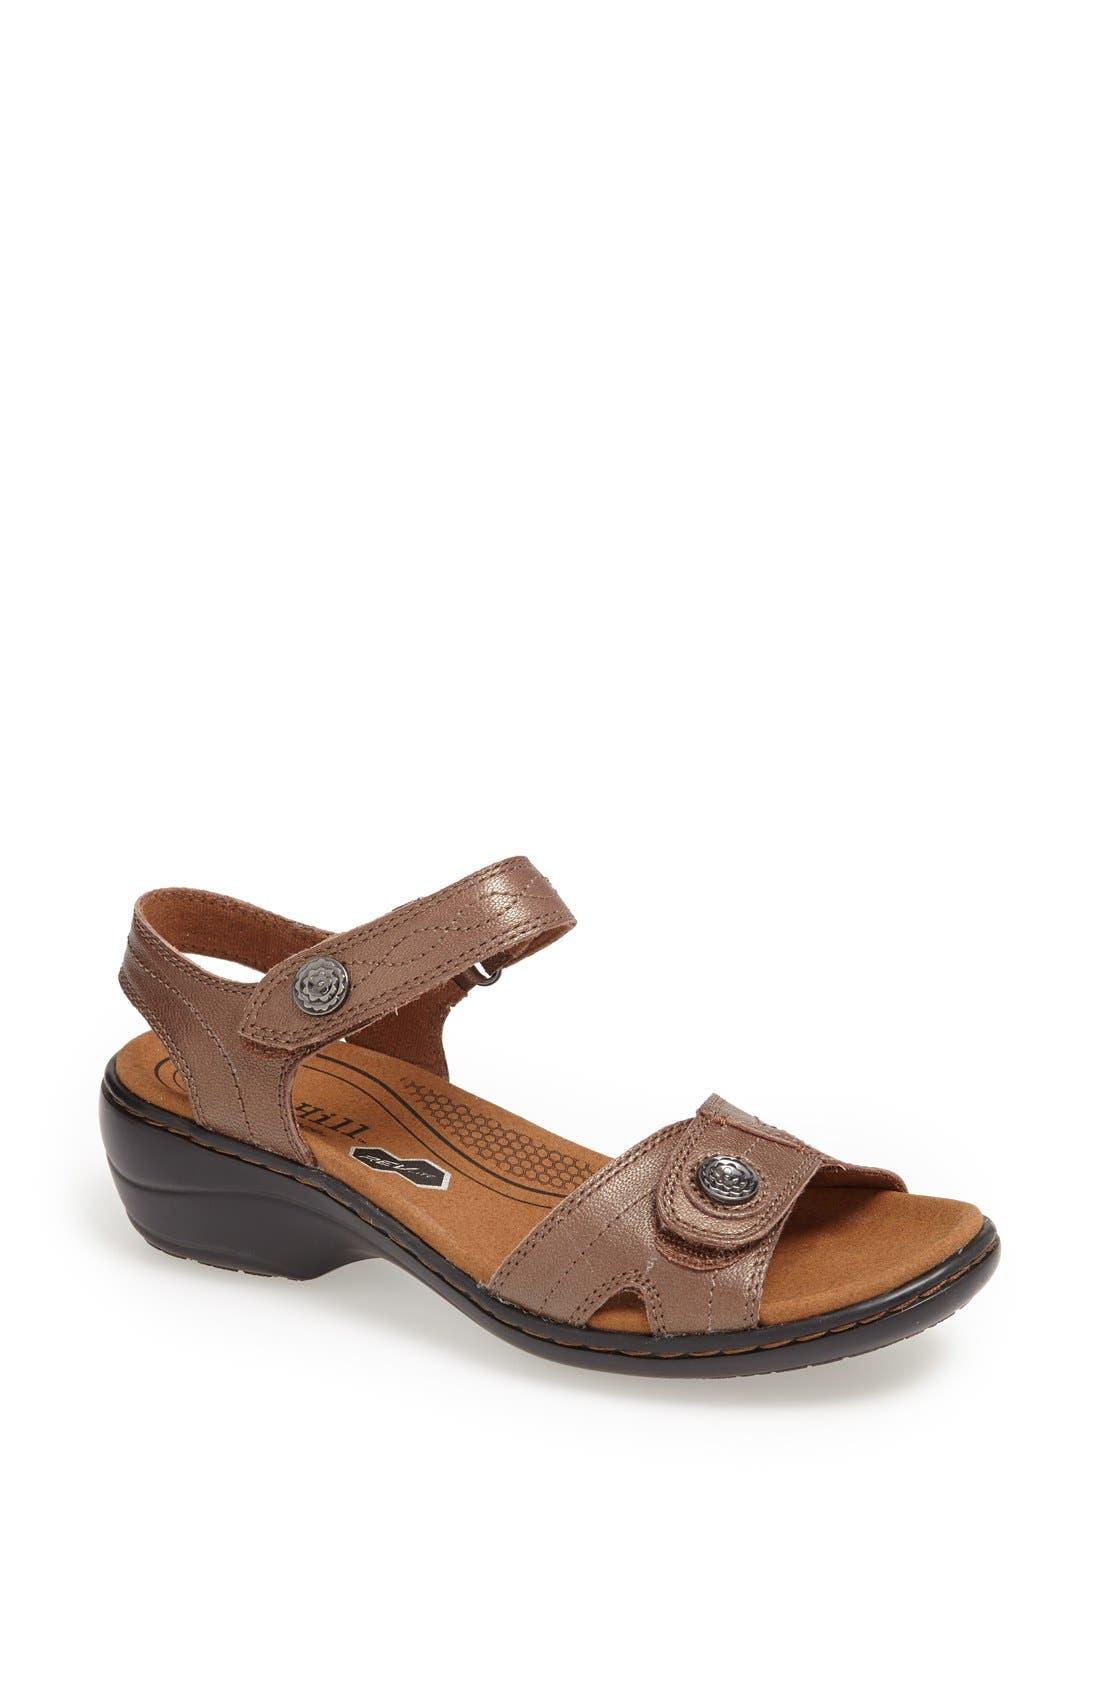 Main Image - Cobb Hill 'Minx' Sandal